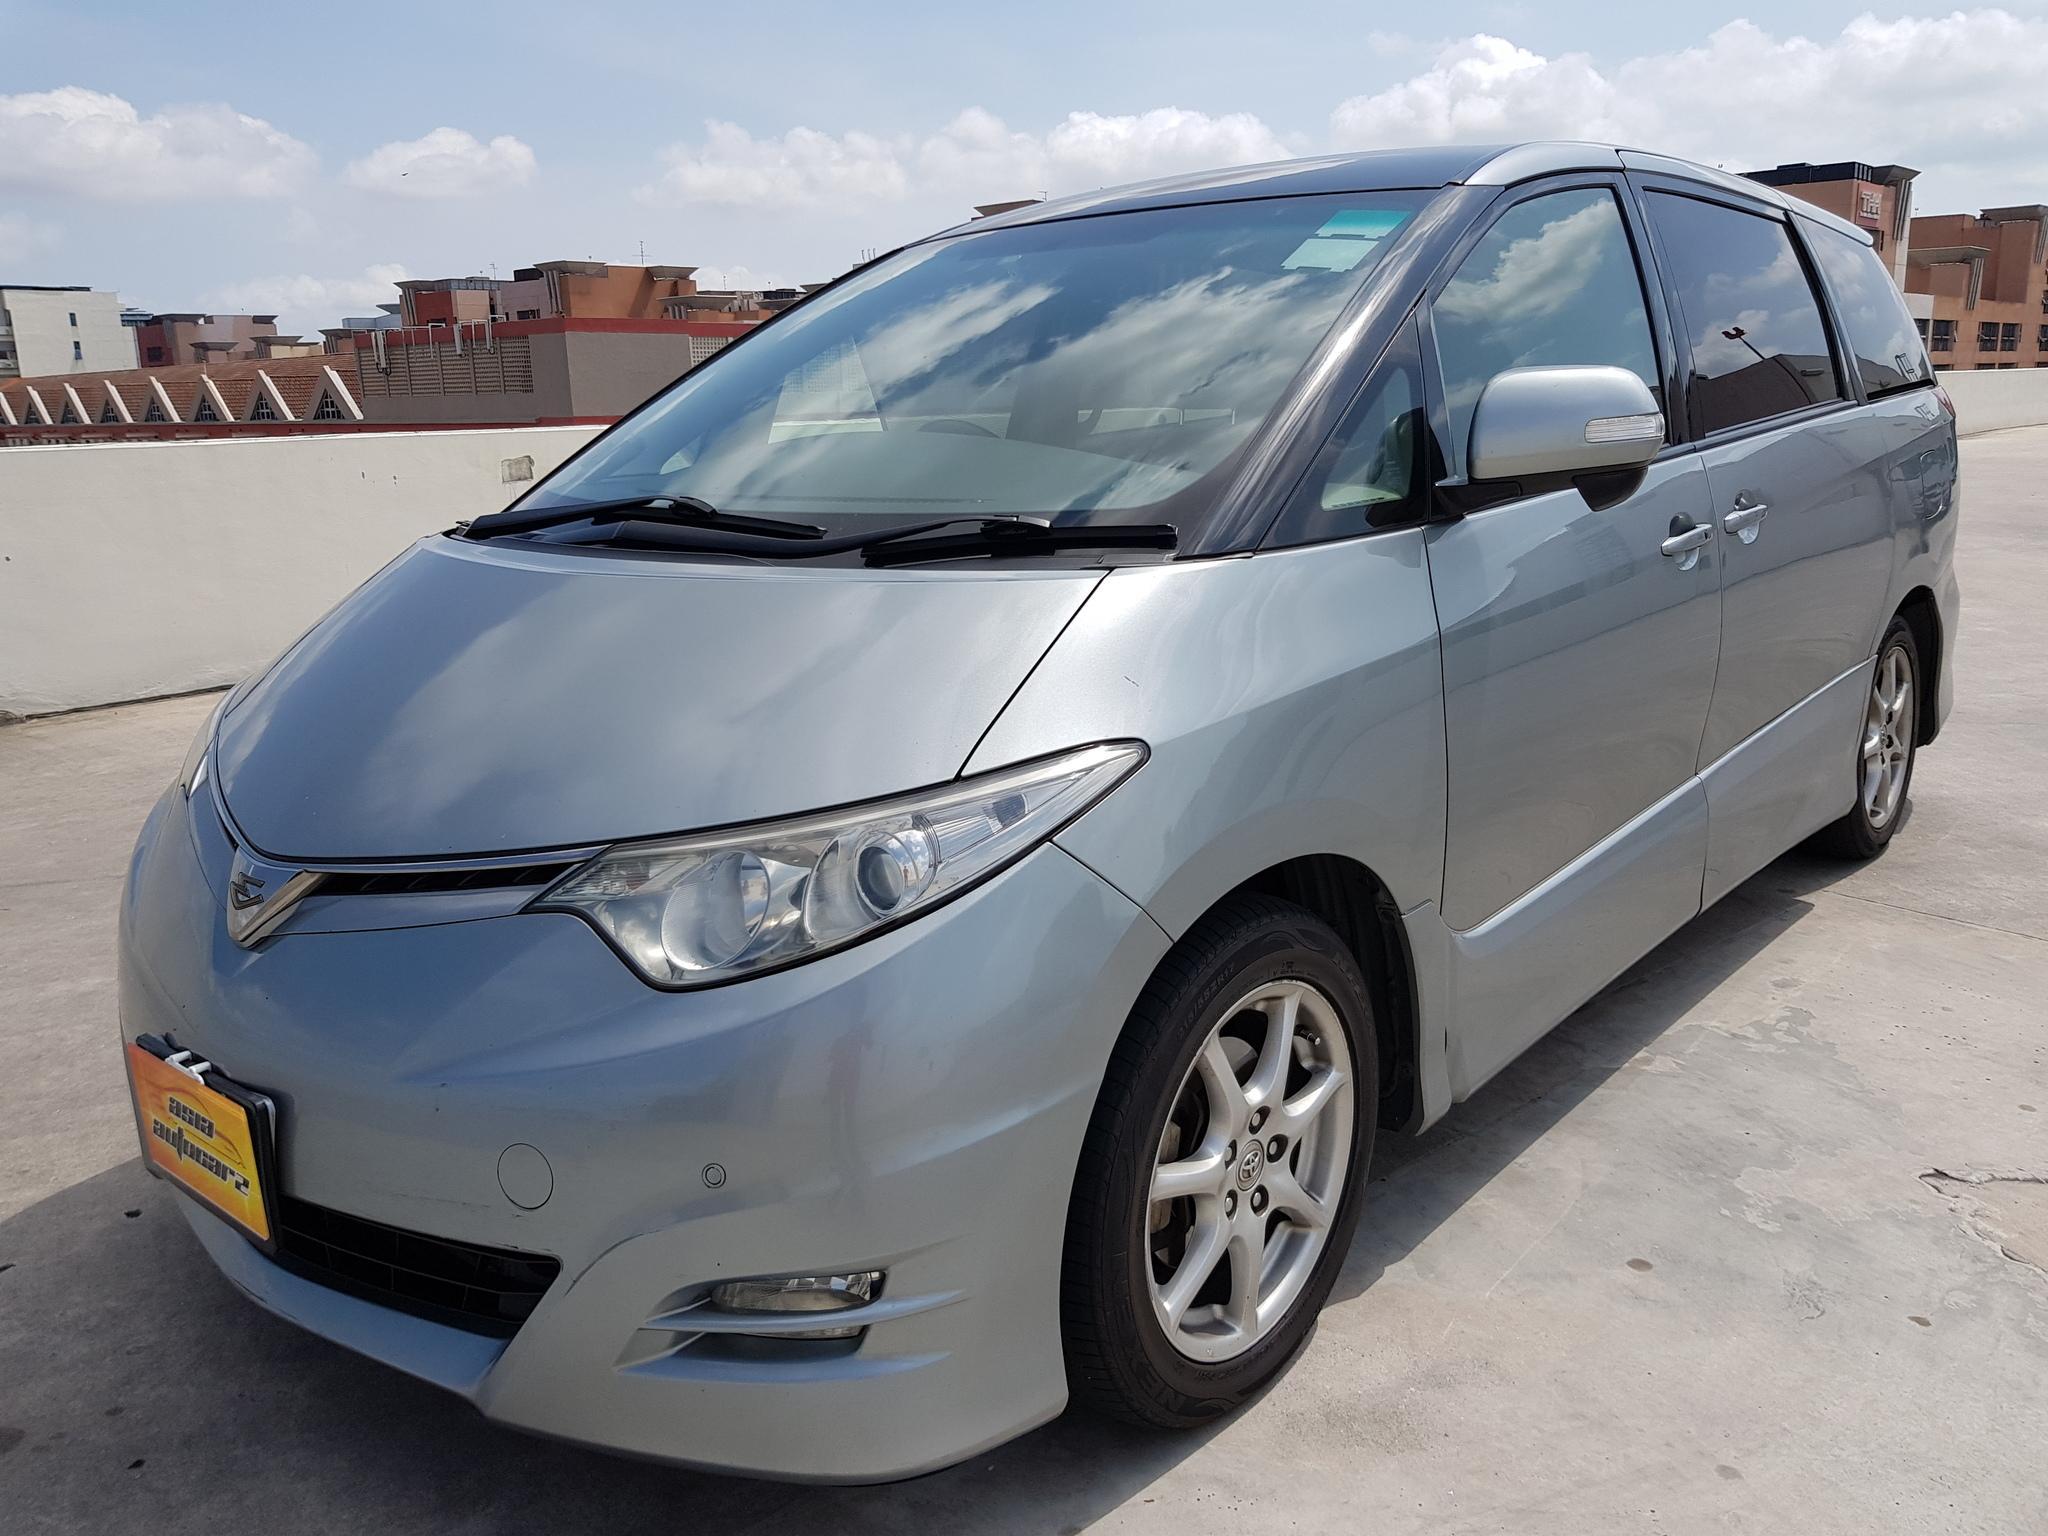 Toyota Estima 2.4 Aeras Auto